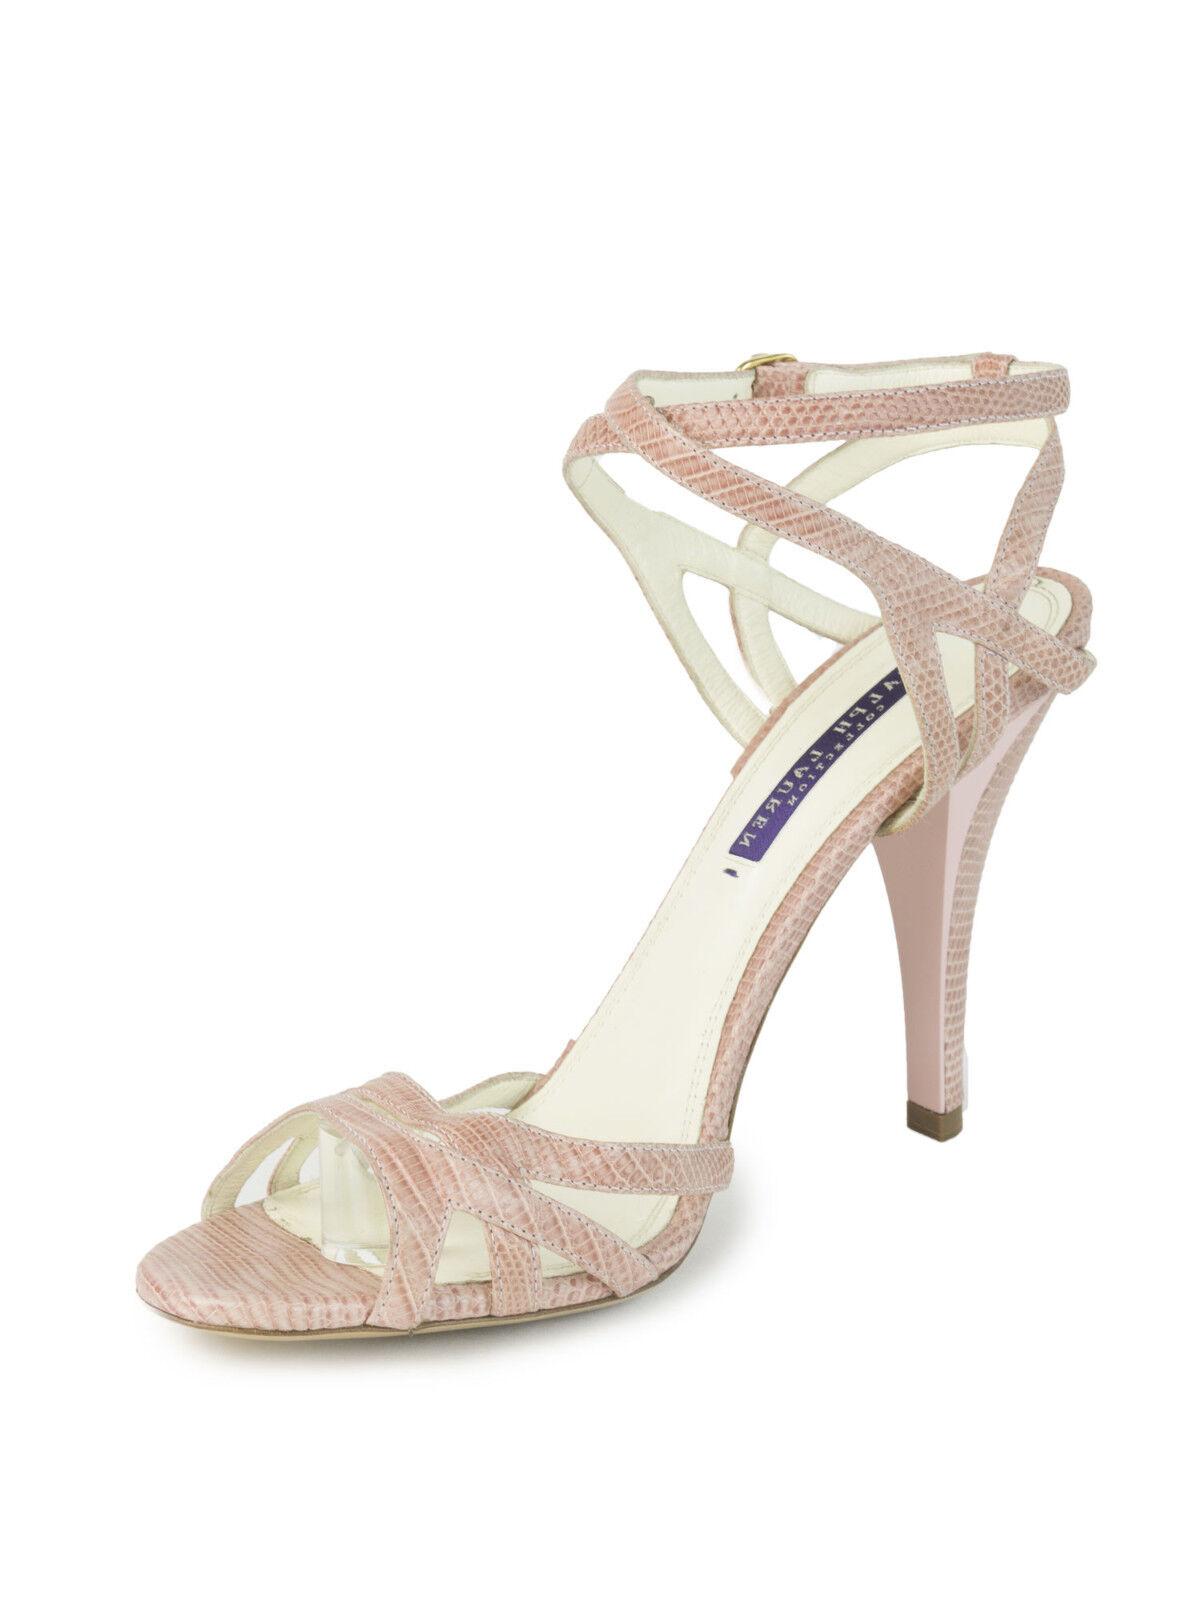 Ralph Lauren púrpura Label Mujer rosado Sandalias De Lagarto Punta Punta Punta Abierta Talla 9.5  625 Nuevo  ventas de salida